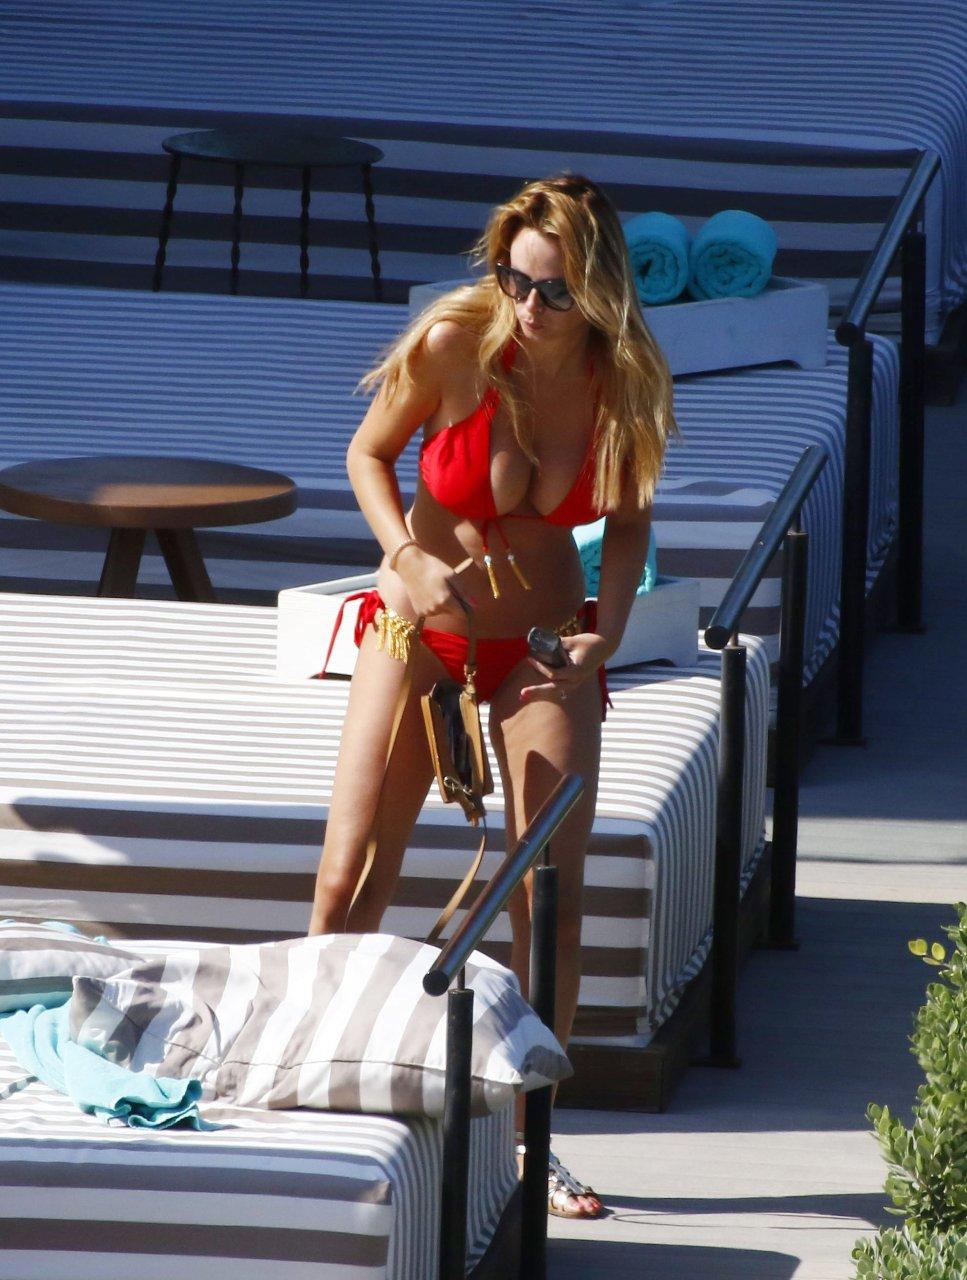 Rhian-Sugden-Sexy-Topless-TheFappeningBlog.com-57.jpg